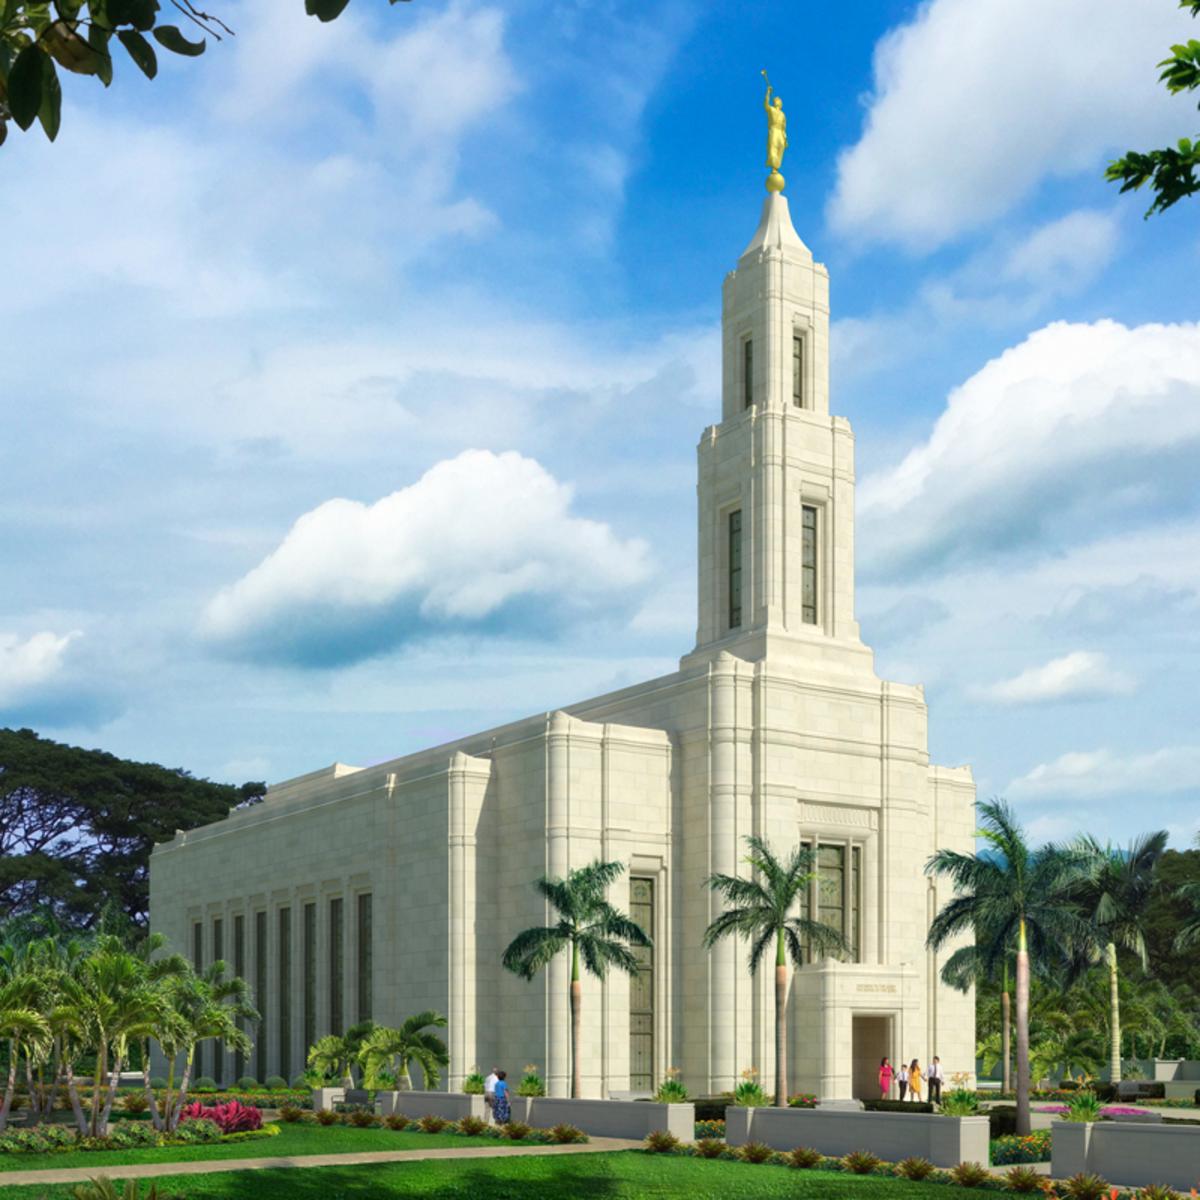 Artist rendering of the Urdaneta Philippines Temple.